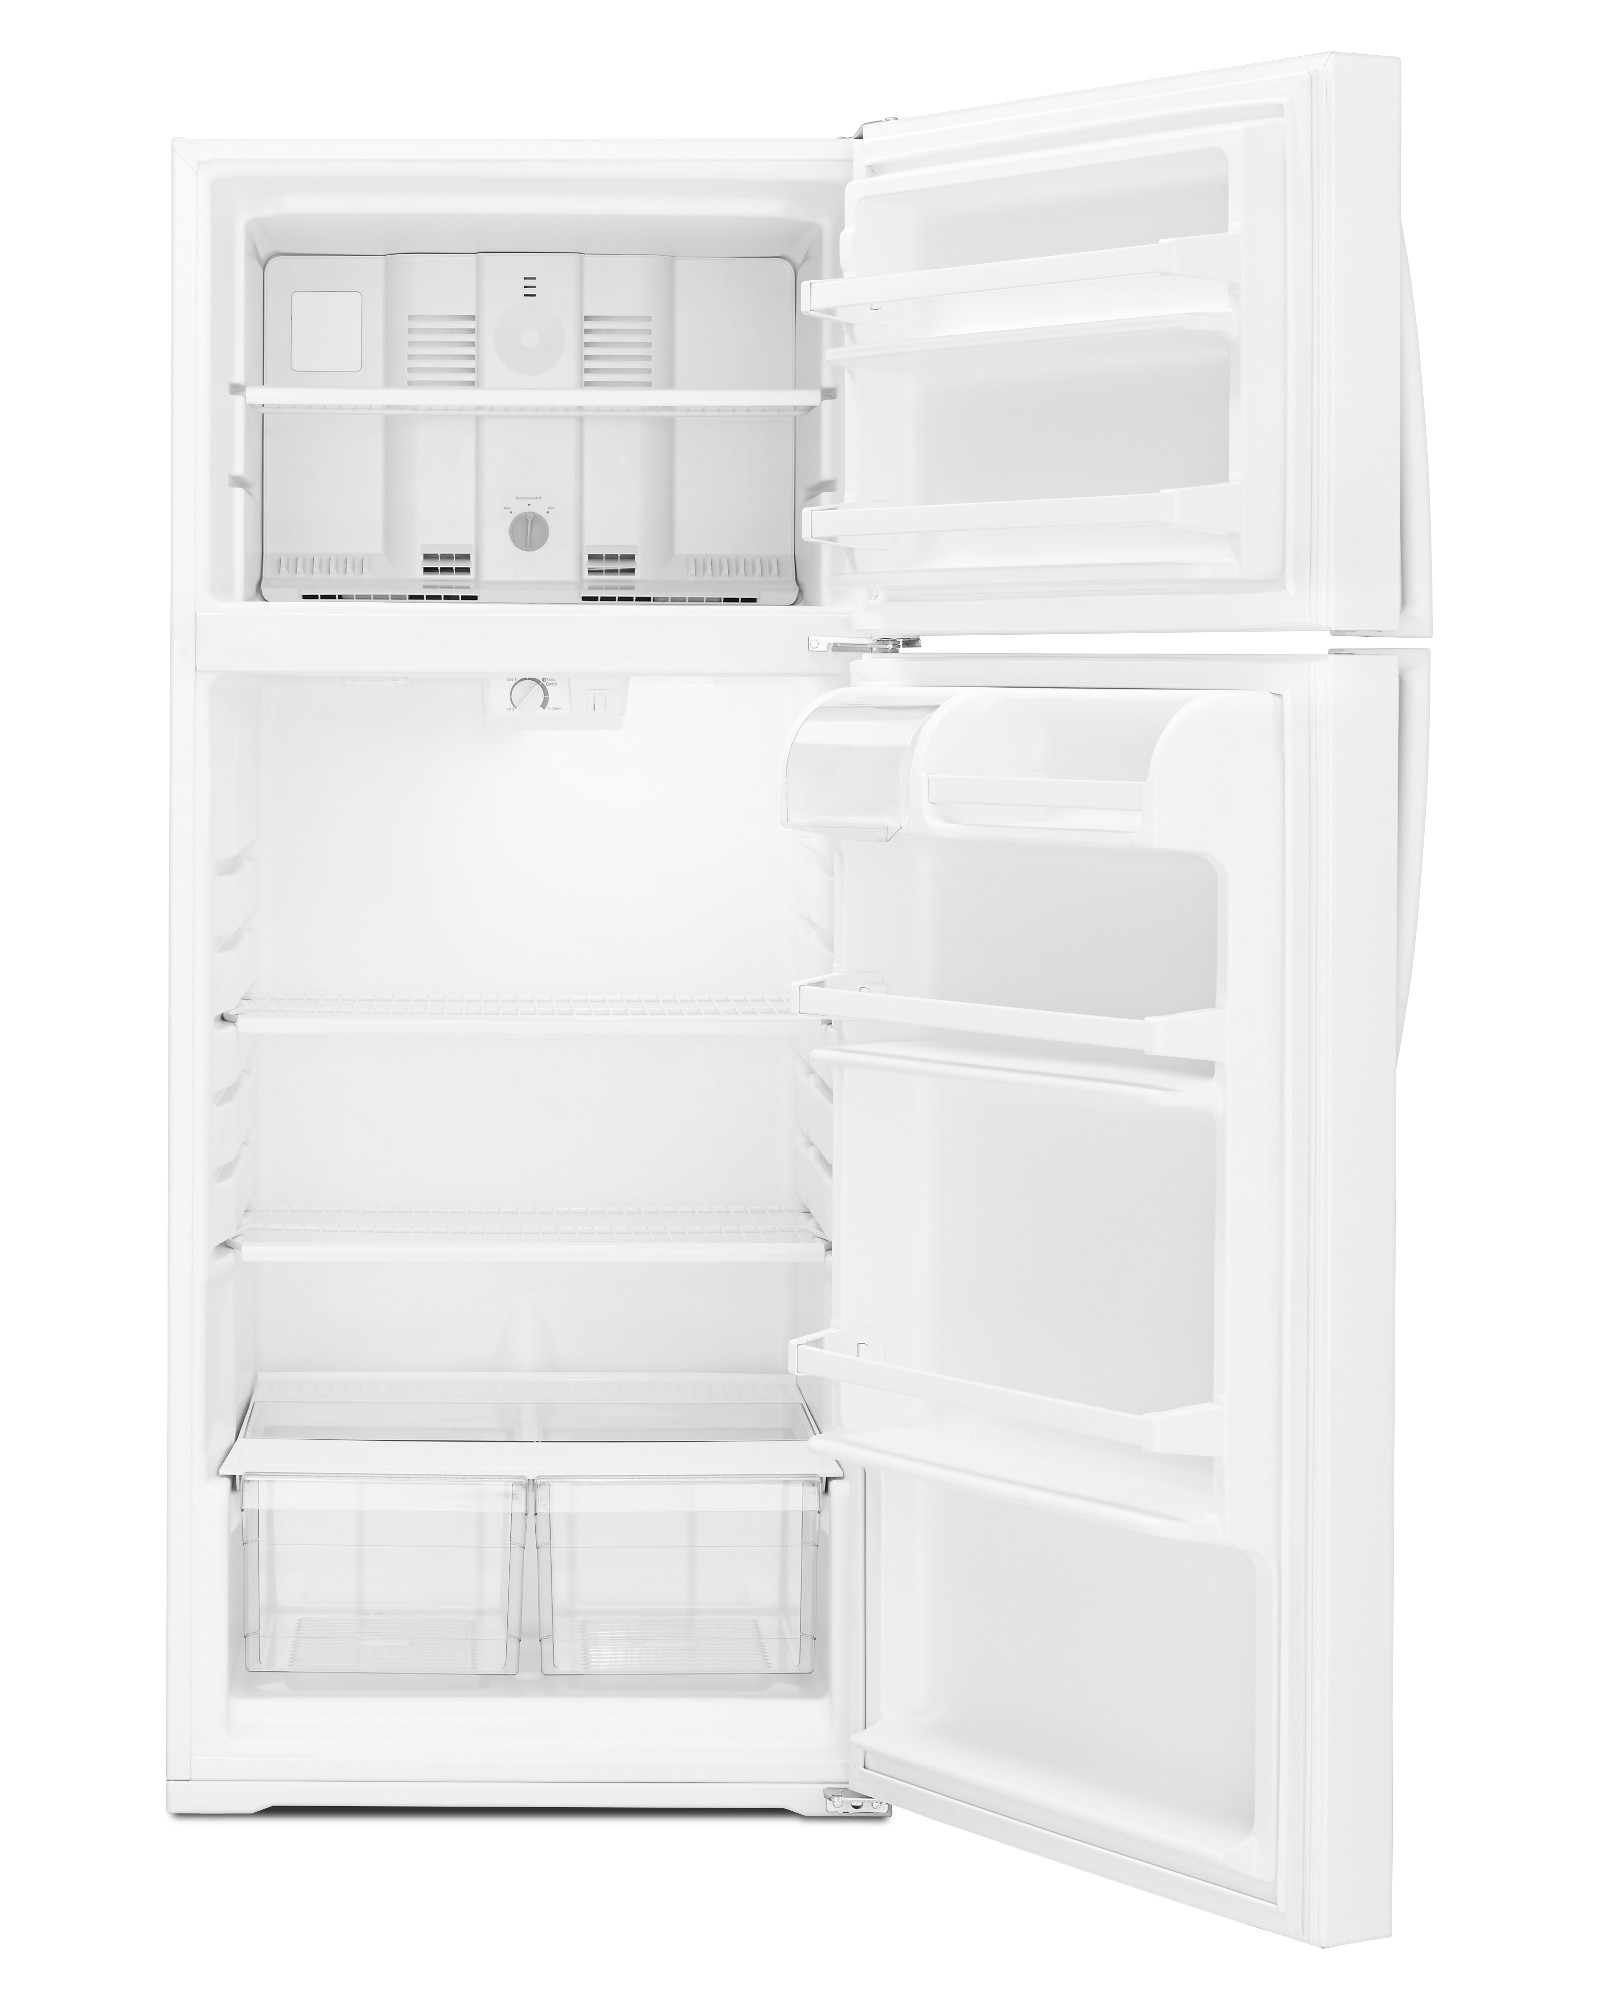 Whirlpool 14.3 cu. ft. Top Freezer Refrigerator - White